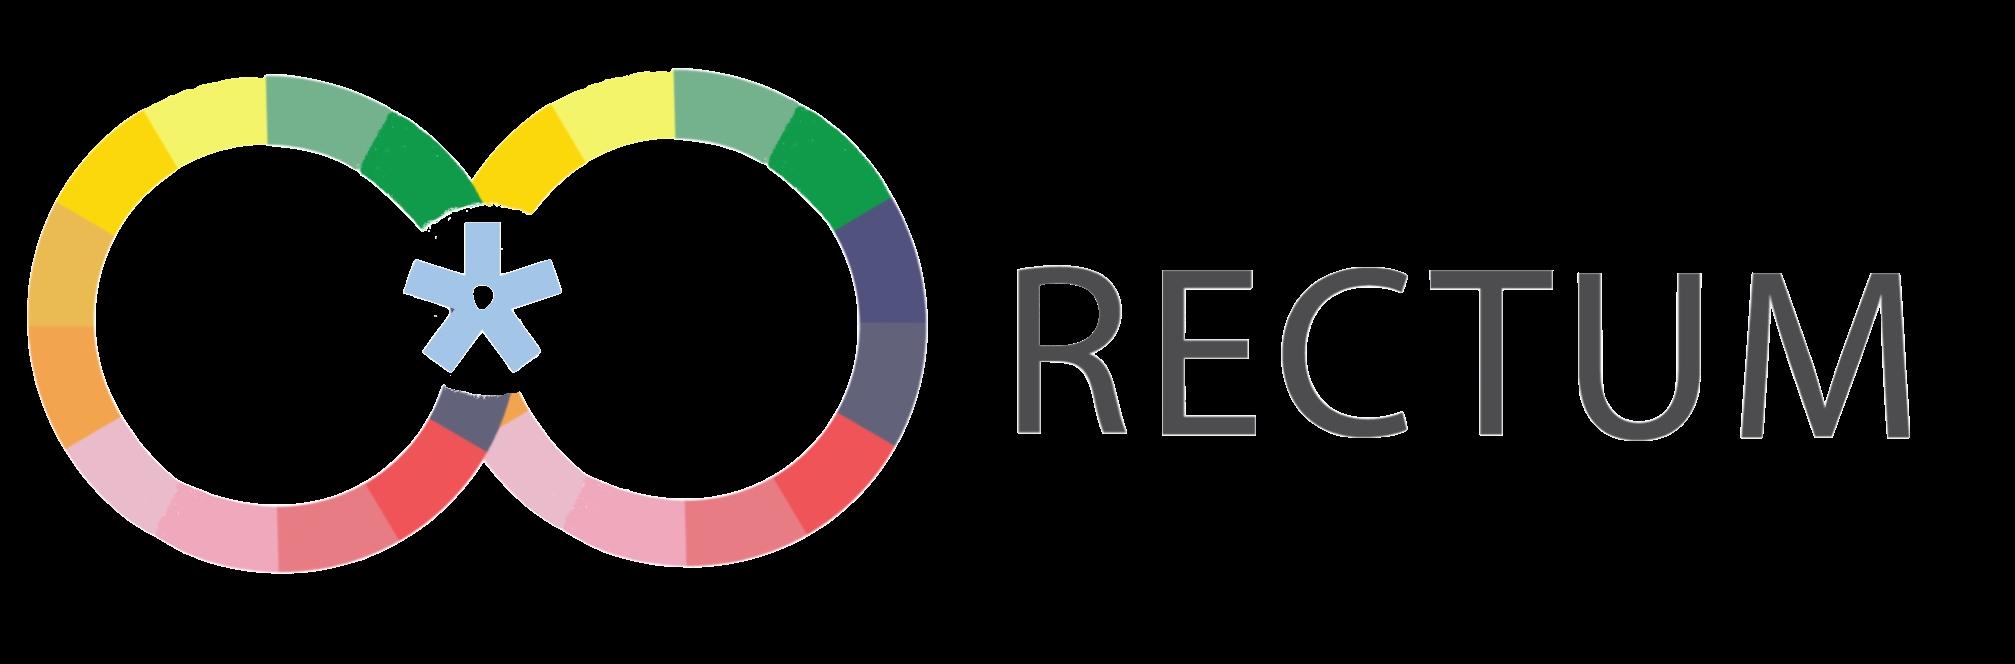 Rectum_Logo.png